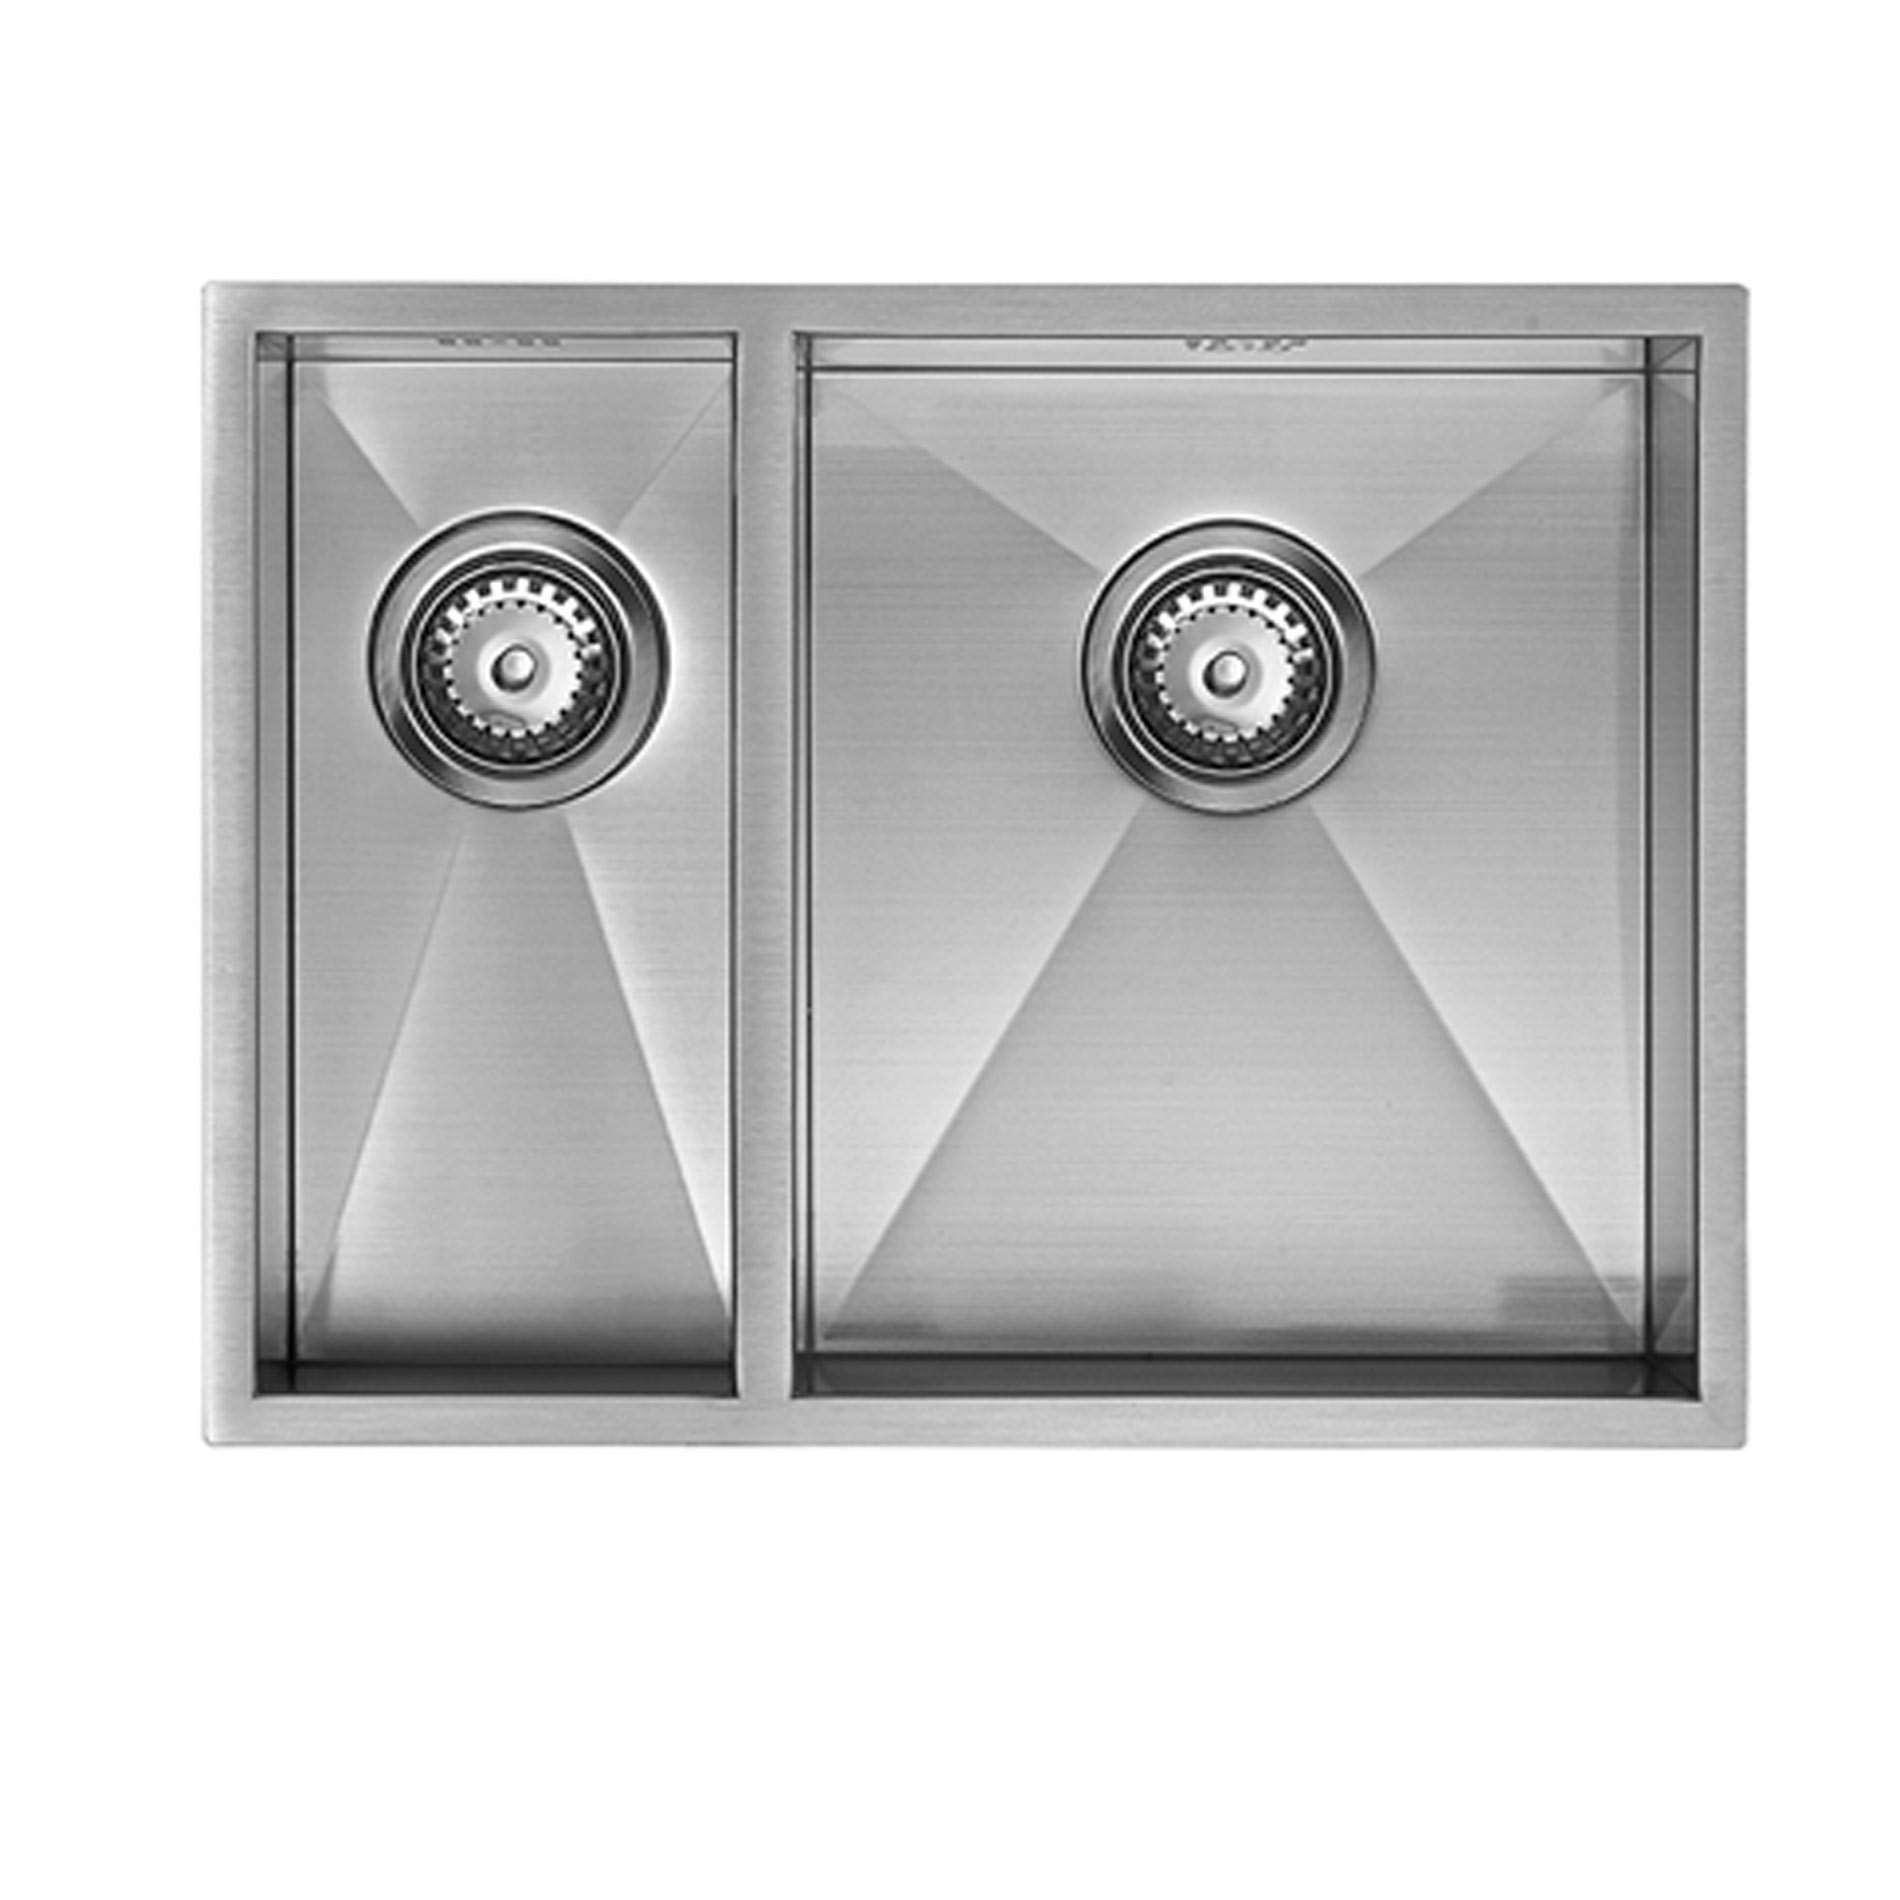 Picture of Zenduo 340/180U Stainless Steel Sink